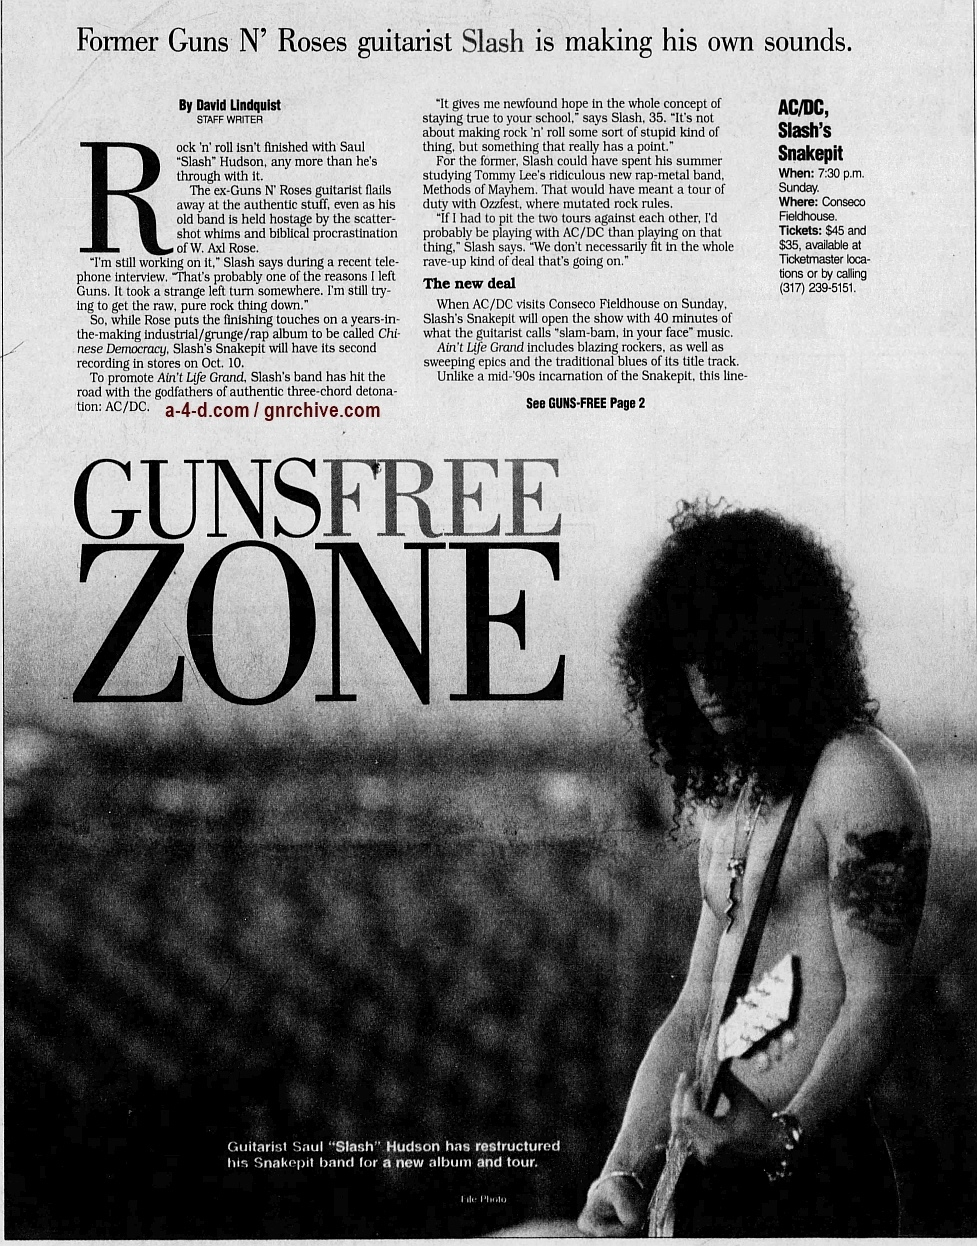 2000.08.25 - Indianapolis Star - Guns Free Zone (Slash) 2000_055